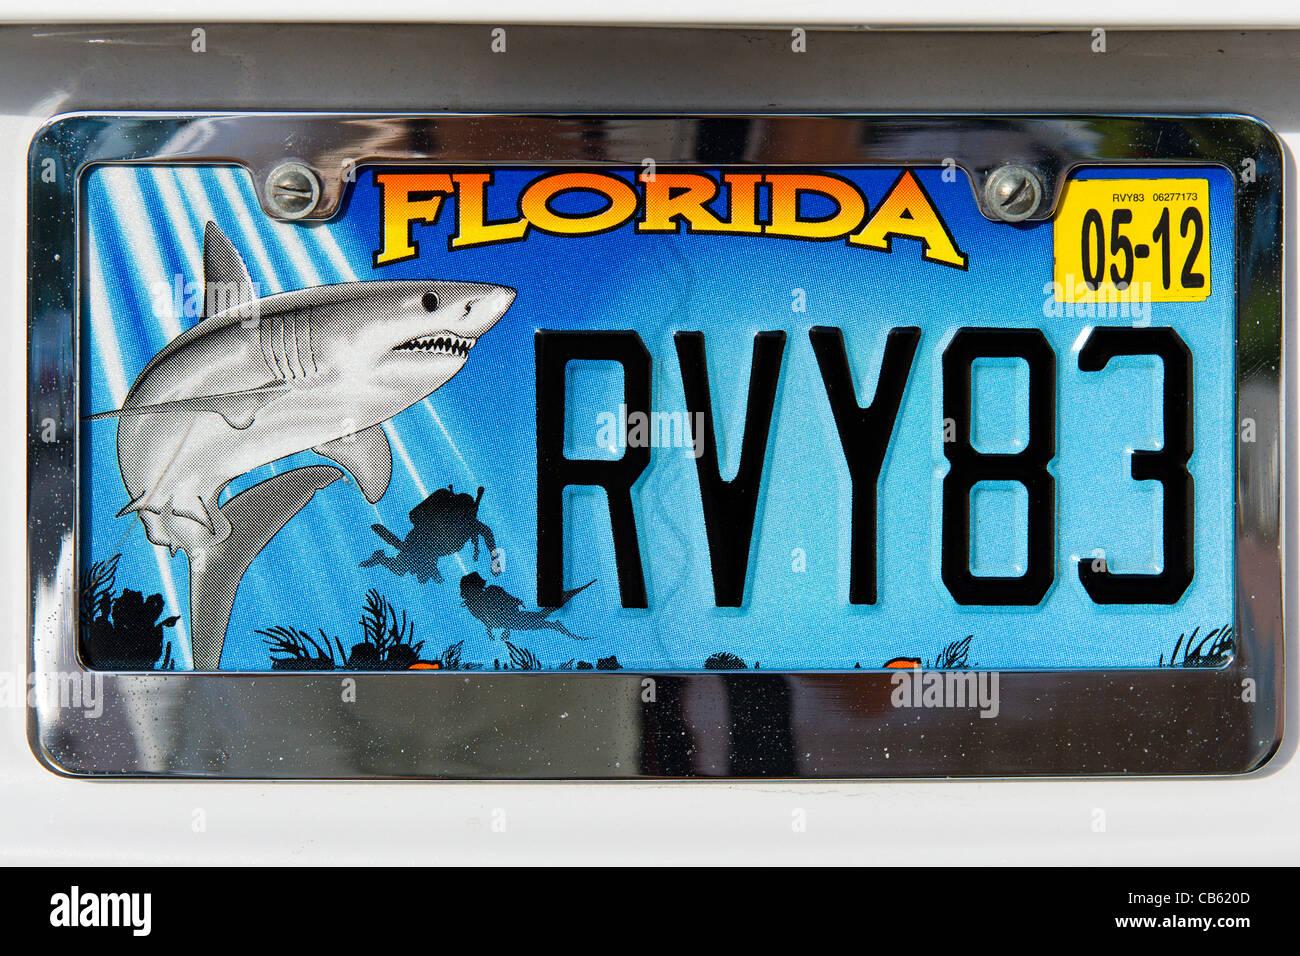 Florida License Plate Stockfotos & Florida License Plate Bilder - Alamy